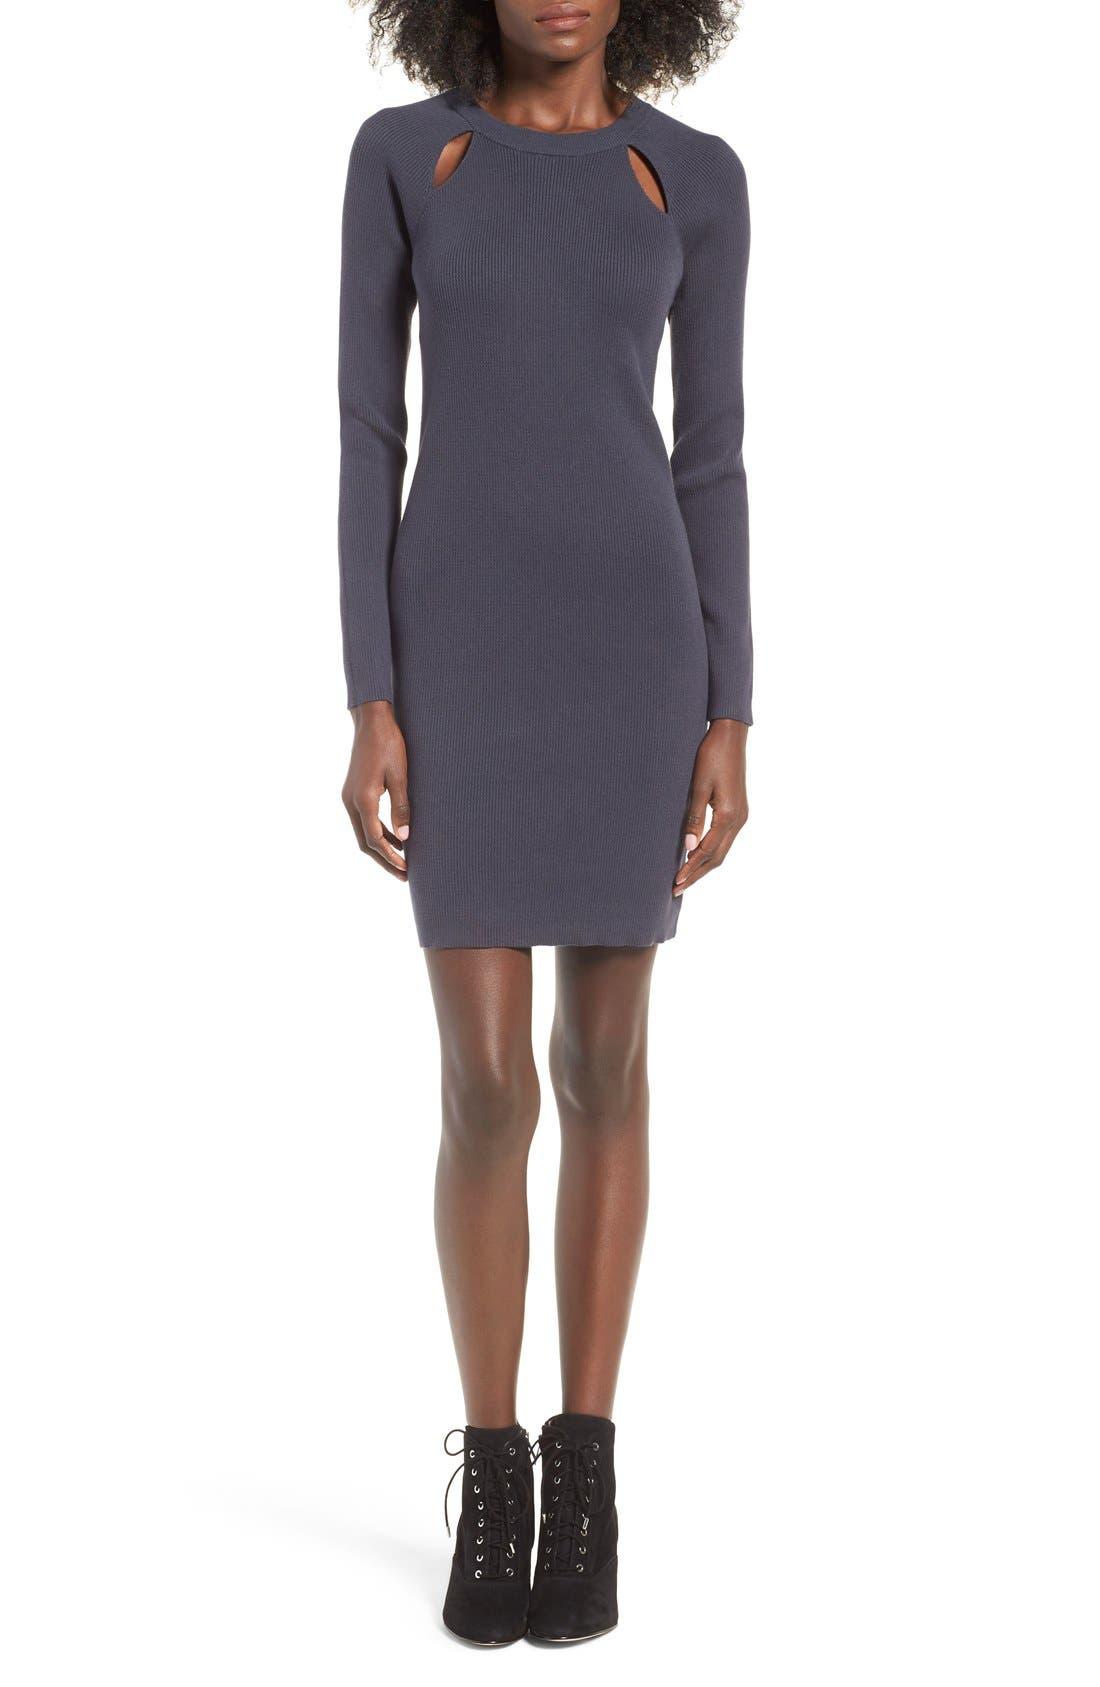 Alternate Image 1 Selected - BP. Cutout Sweater Dress